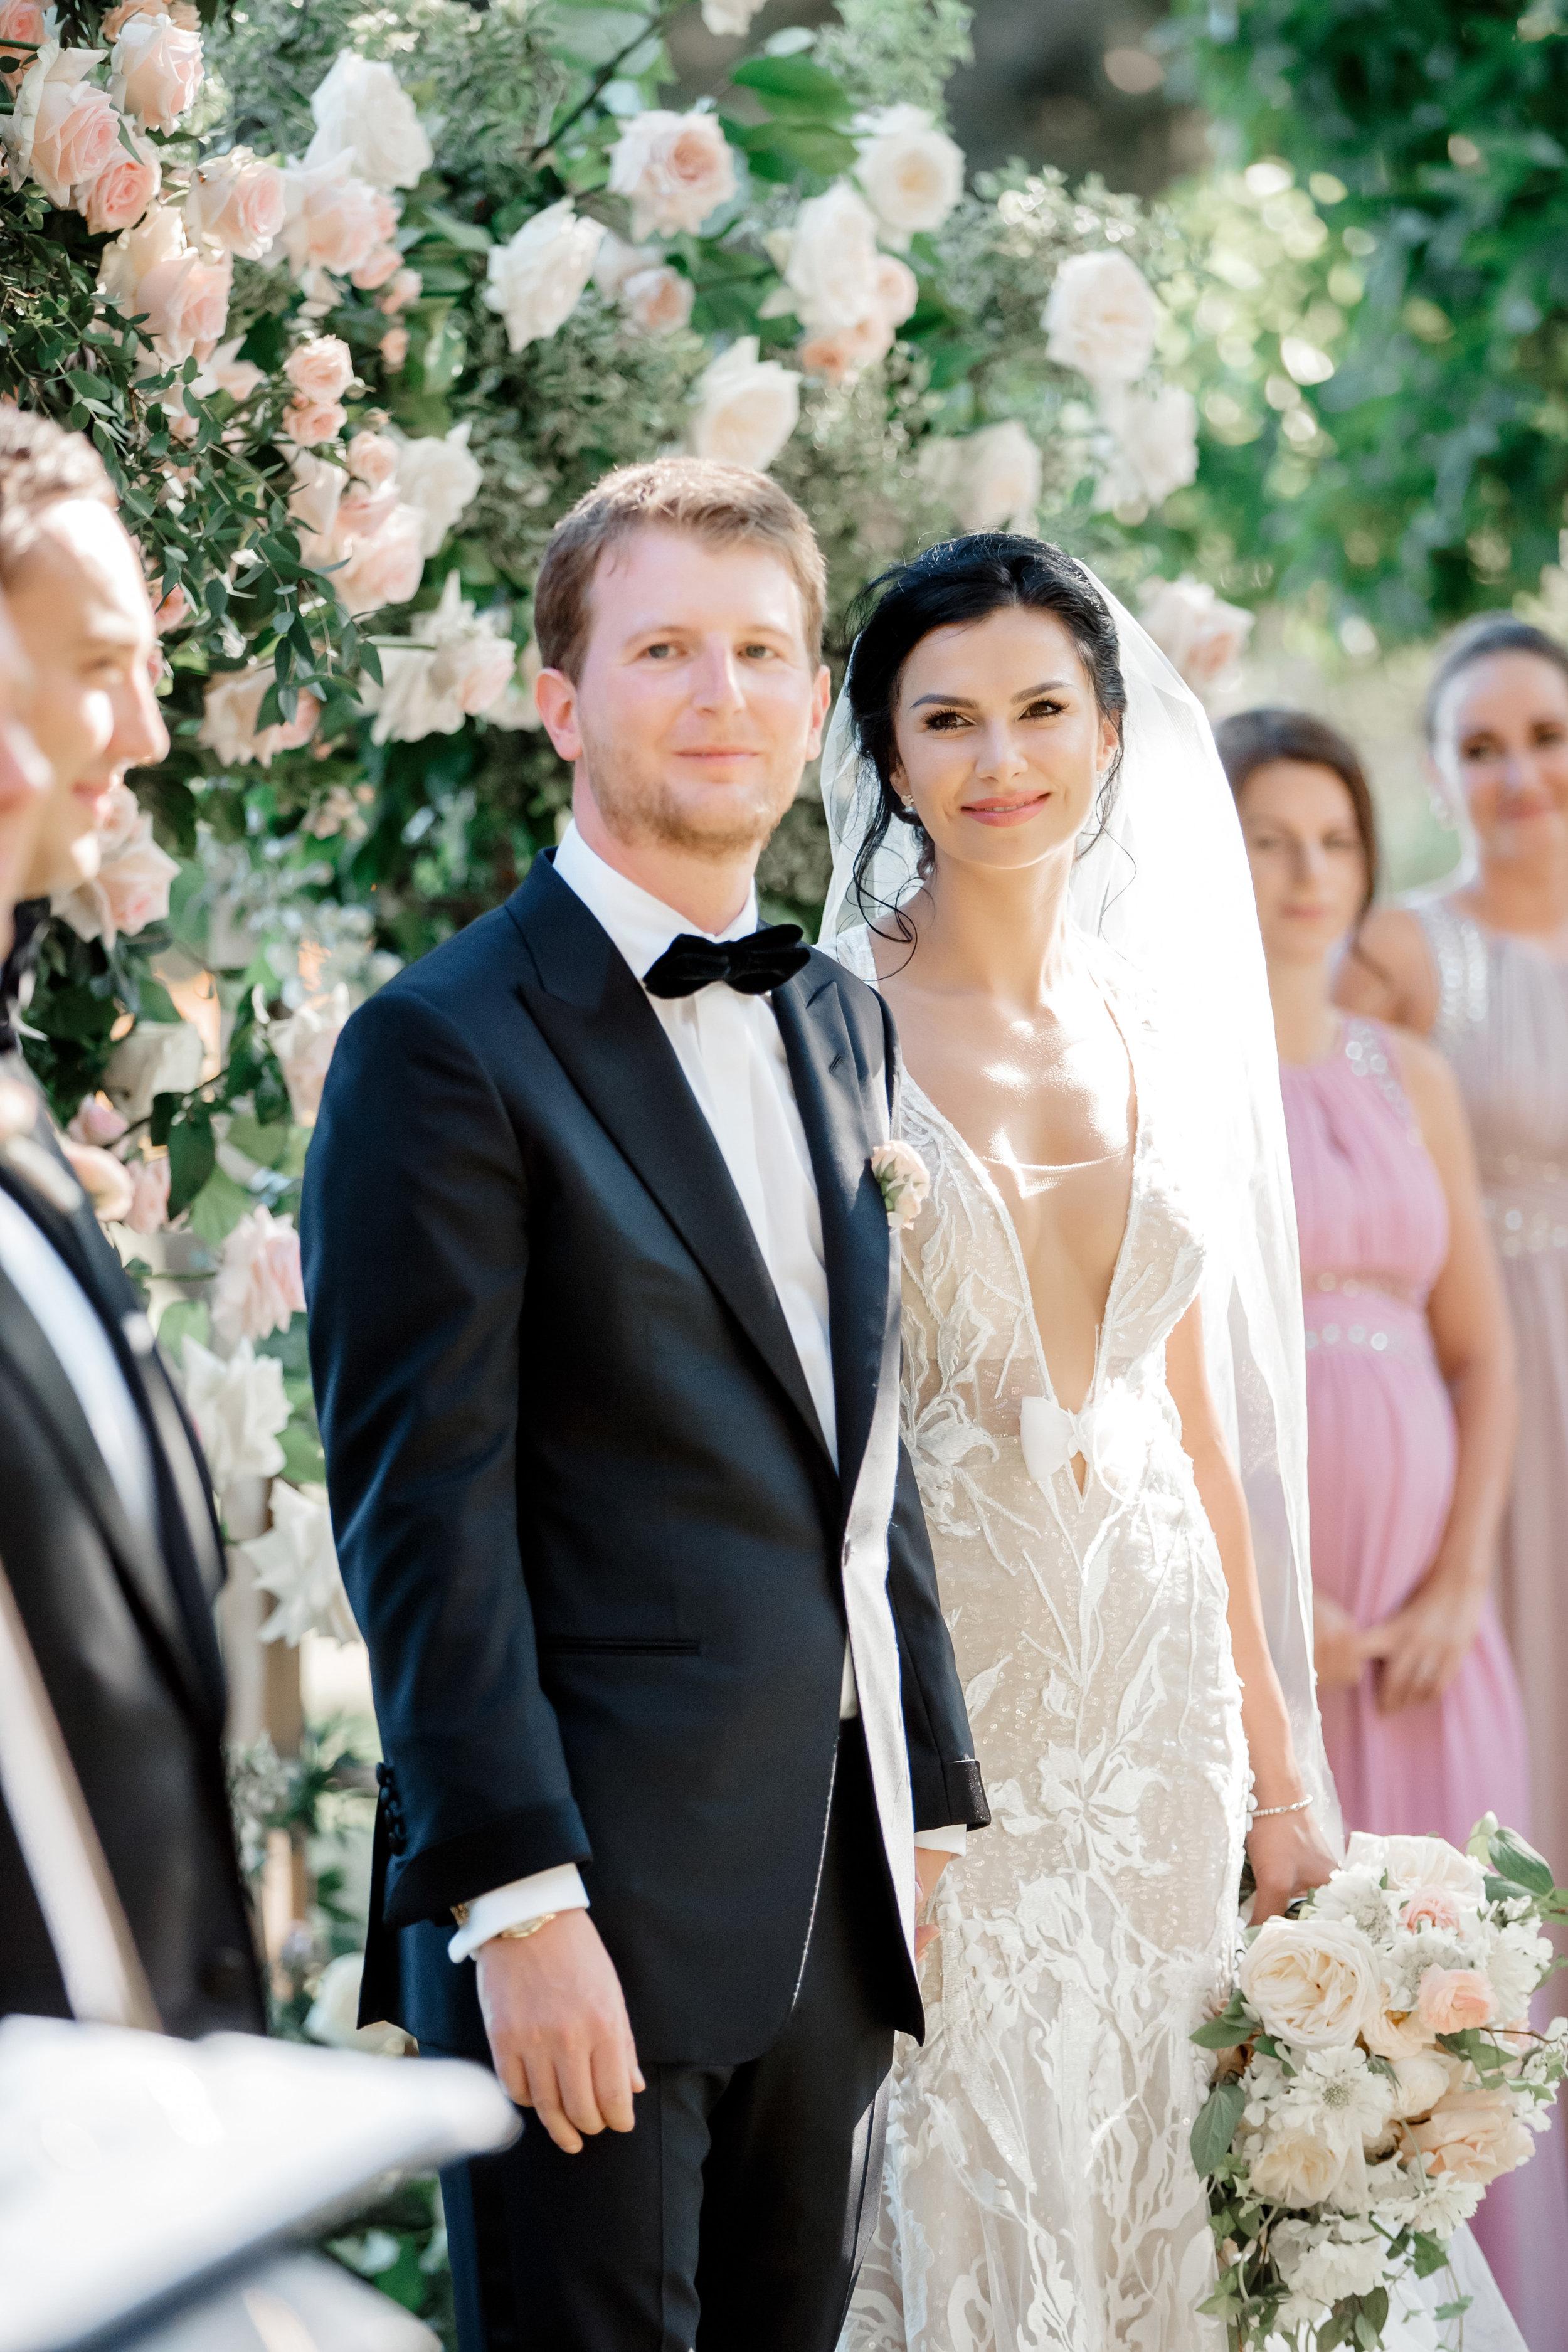 180707-preview-050-Marina-Fadeeva-wedding-photographer.jpg